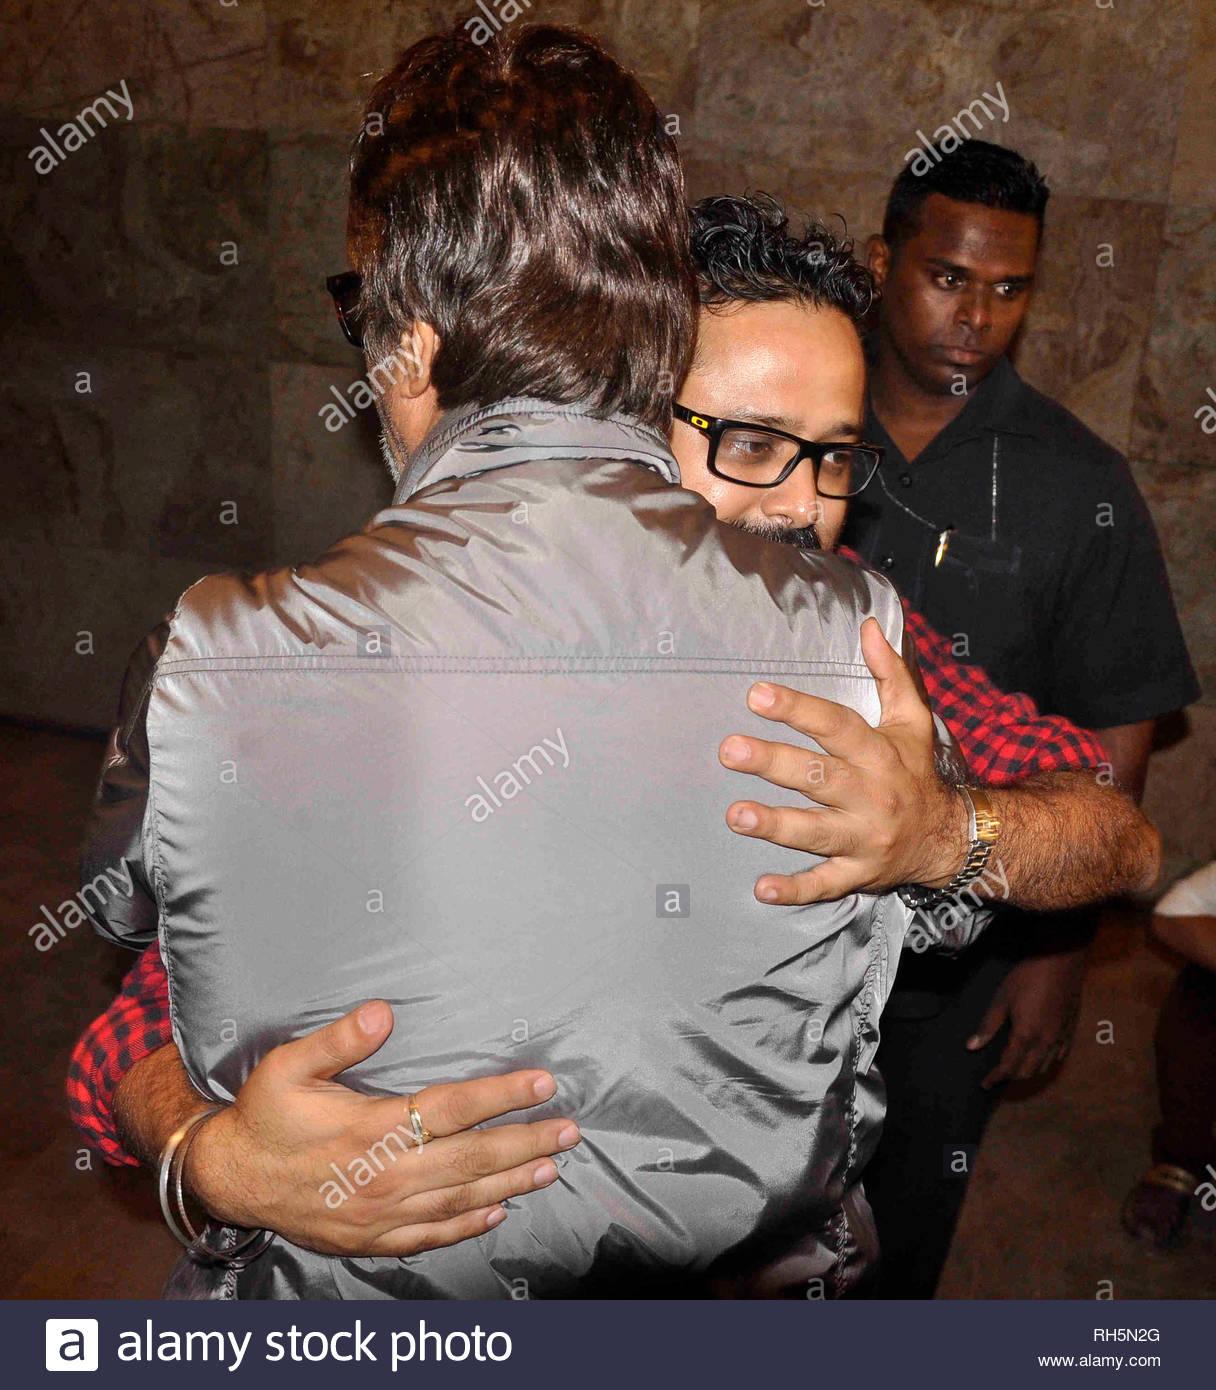 Bollywood actor Amitabh Bachchan hug director Nikhil Advani during